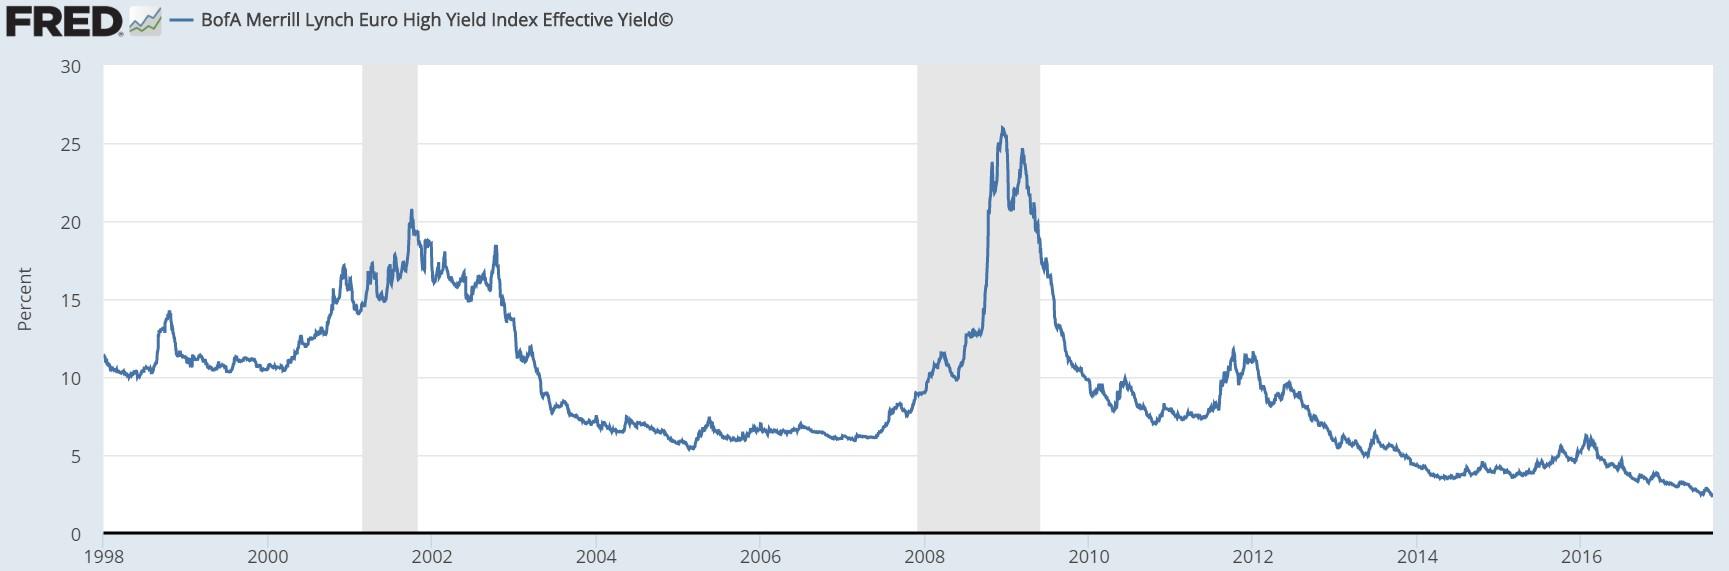 European Junk Bonds Have Very Low Yields